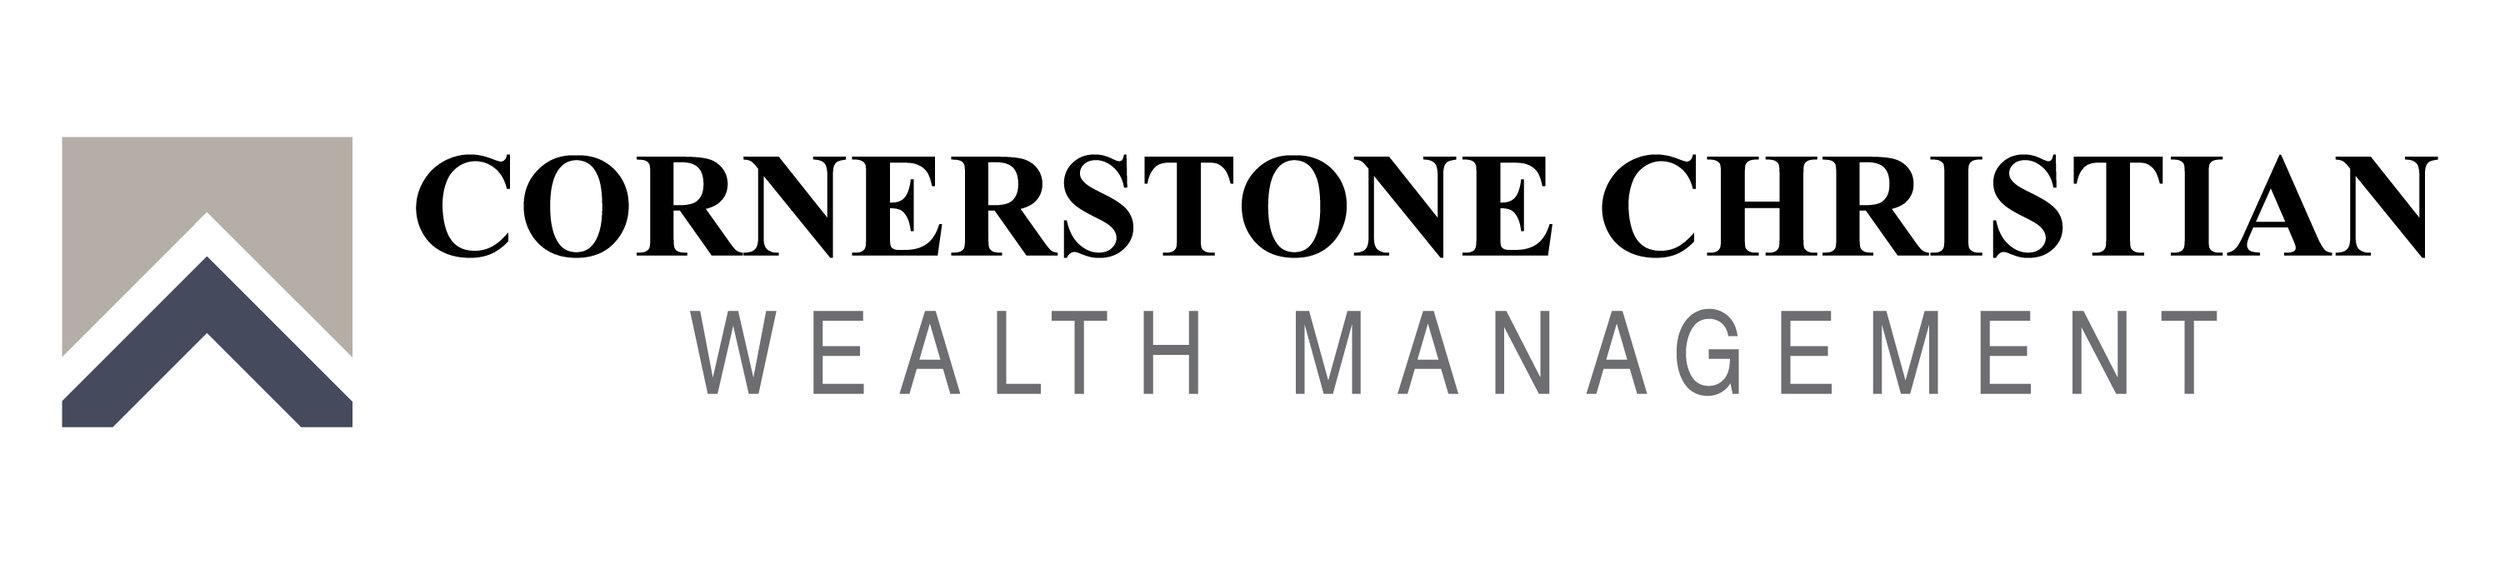 Cornerstone Logo Large Color-01.jpg